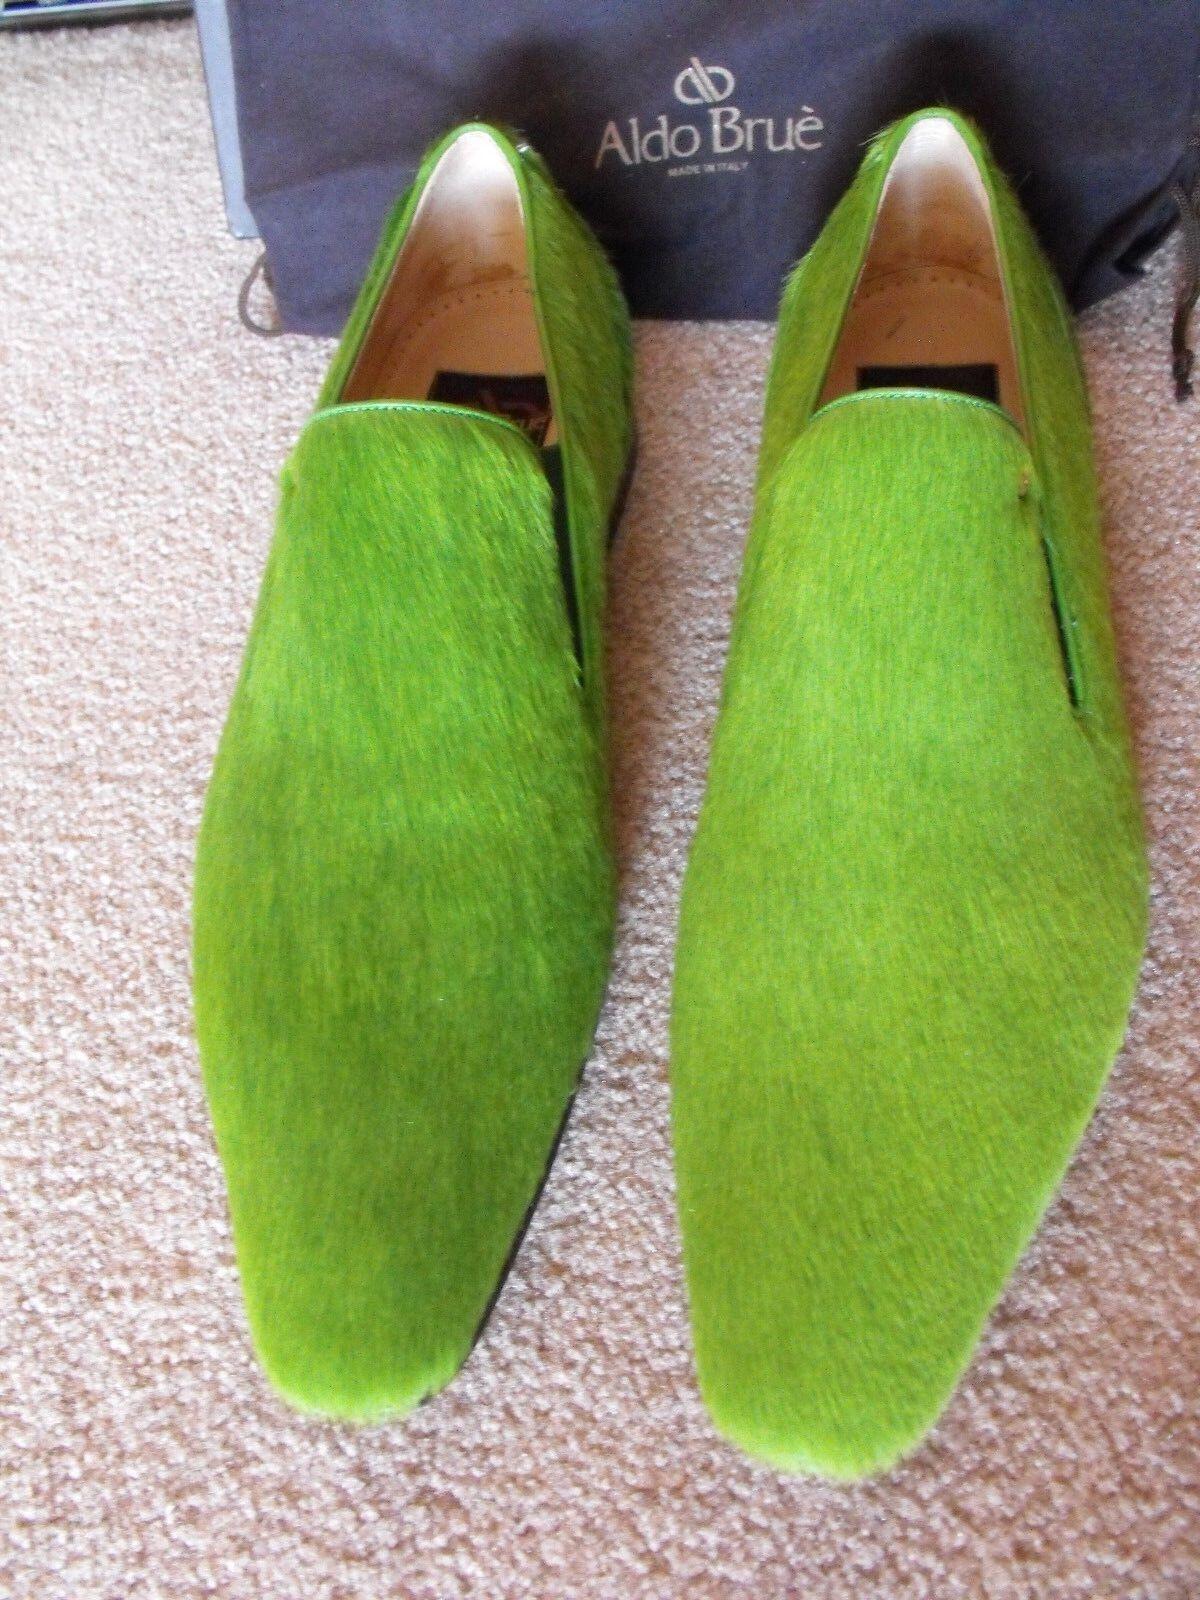 NEUF rare  nouveau without box  1,900 ALDO BRUE Italie vert pony hair loafers US 11 UK 10 EU 44